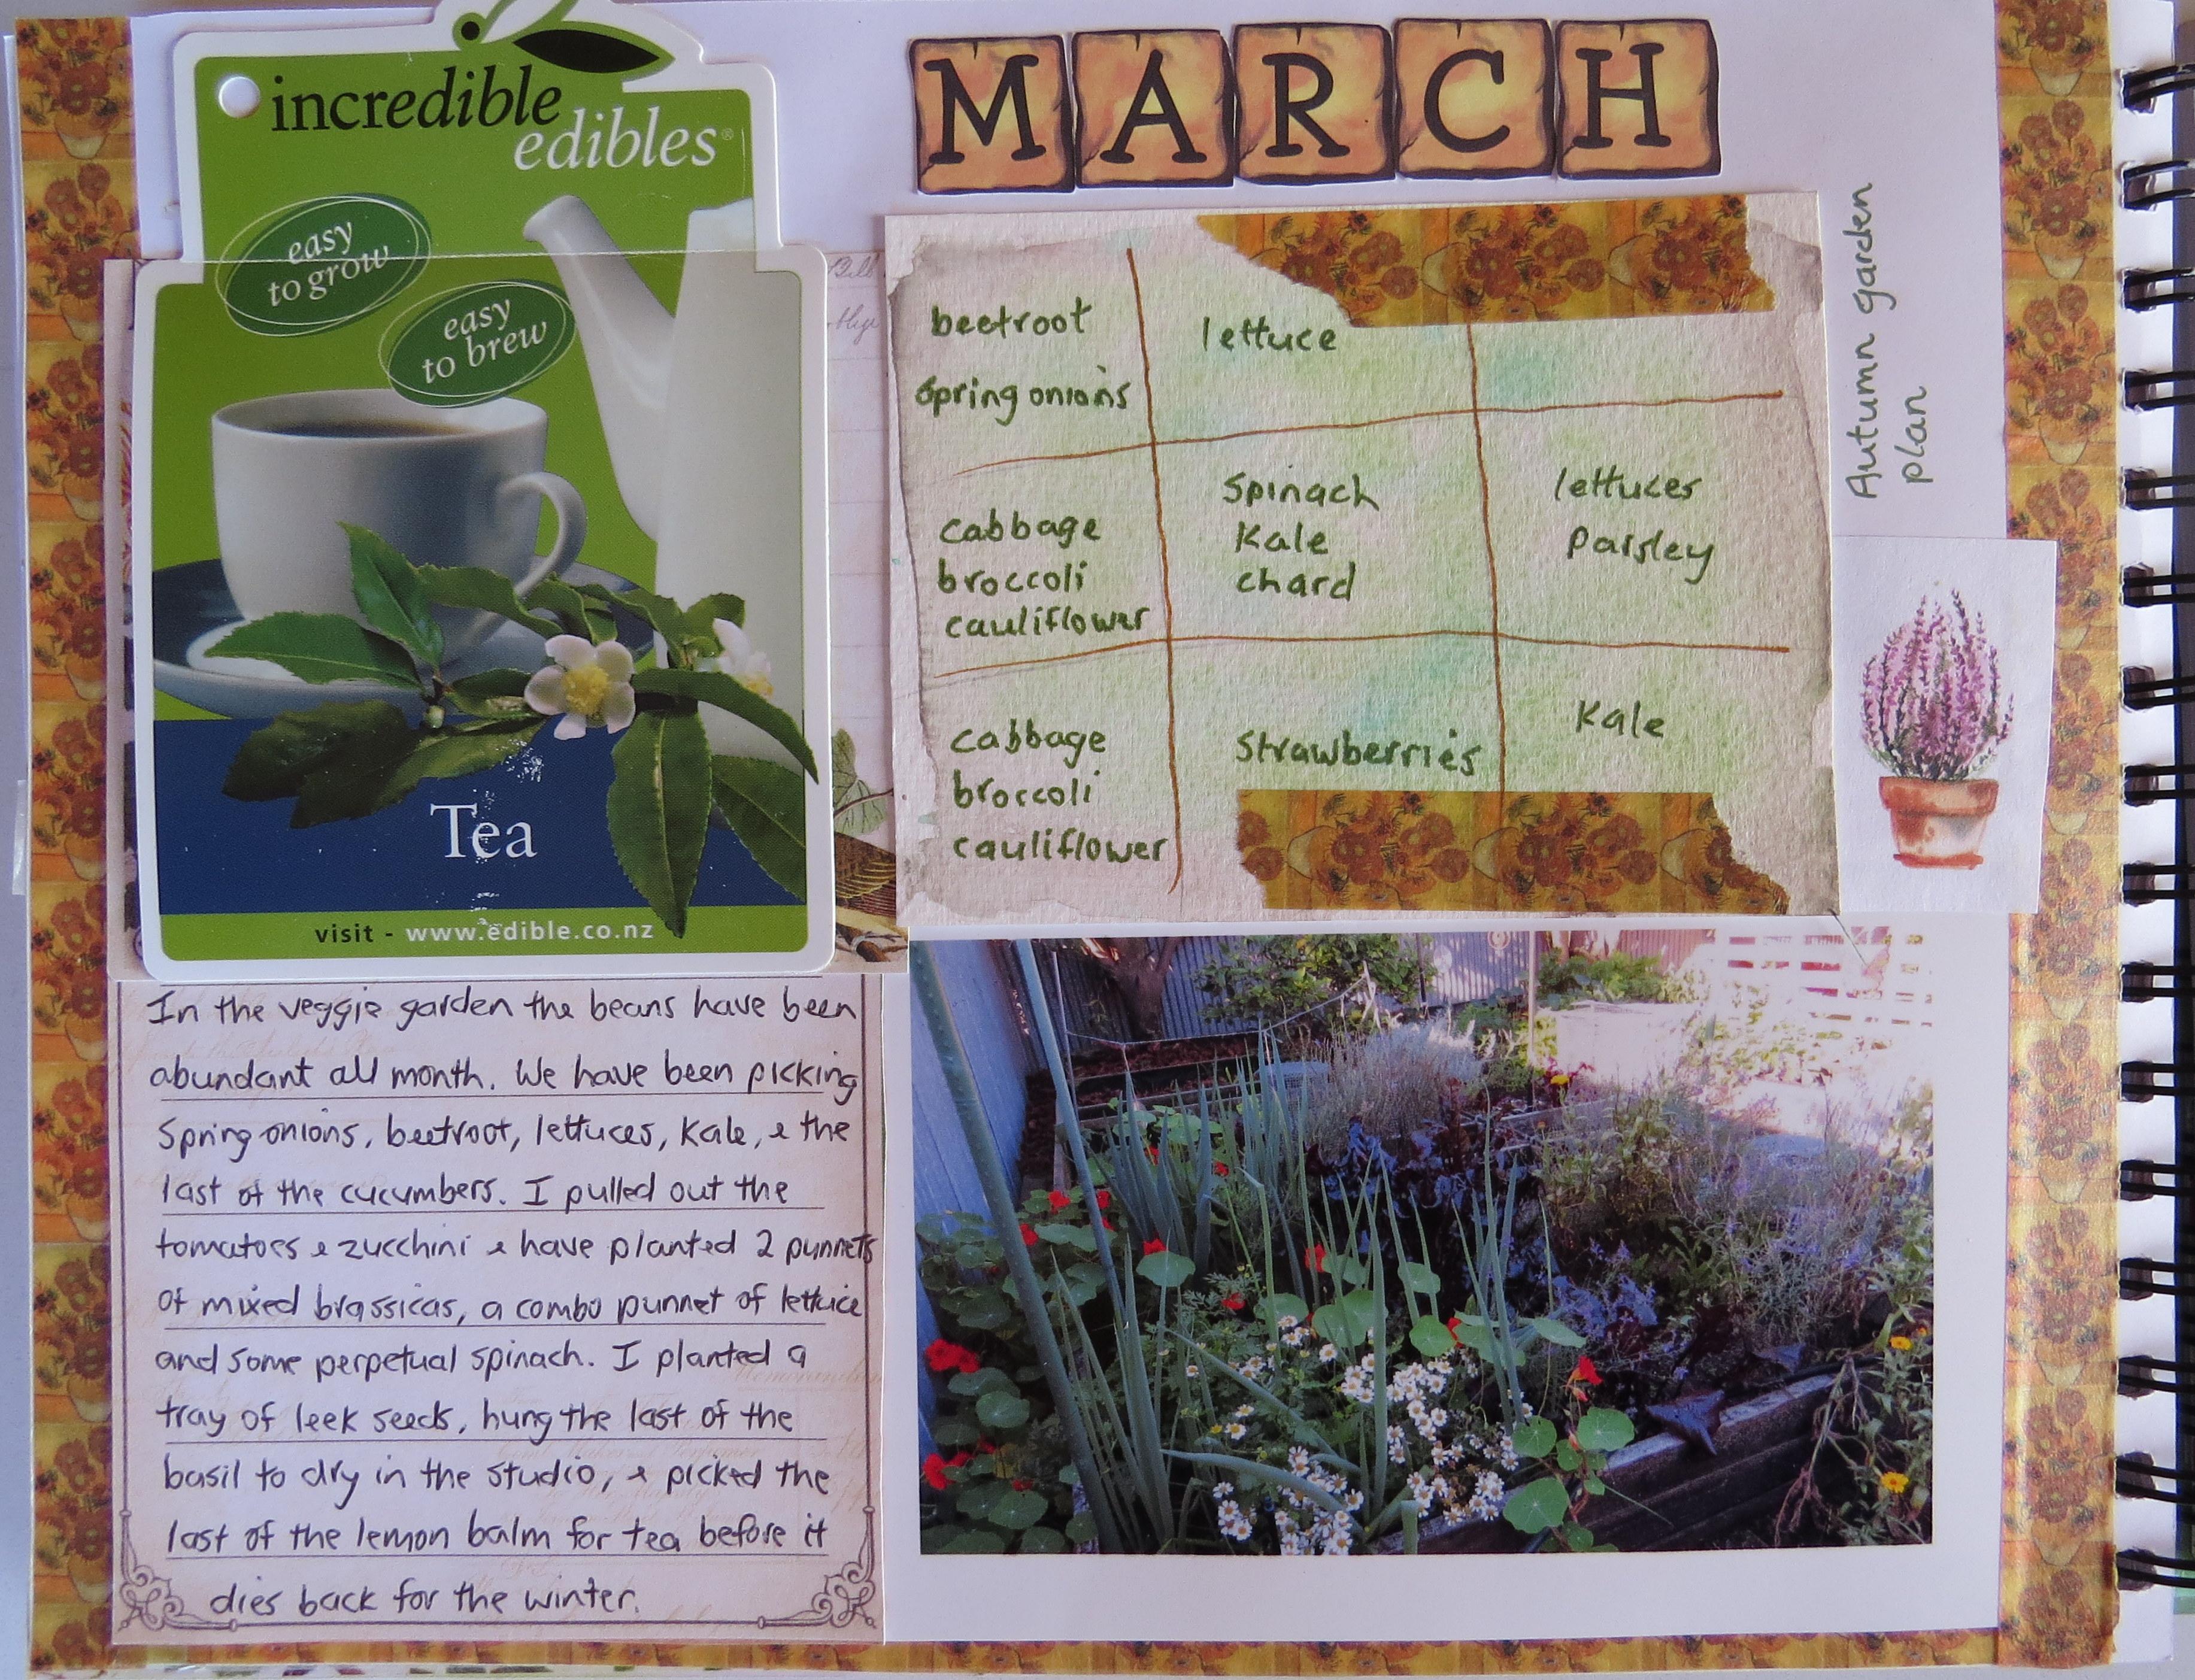 Encouragement March Garden Journal Kristah Price My Image Garden Scanner Driver My Image Garden App Se Are My Garden Journal Pages dpreview My Image Garden